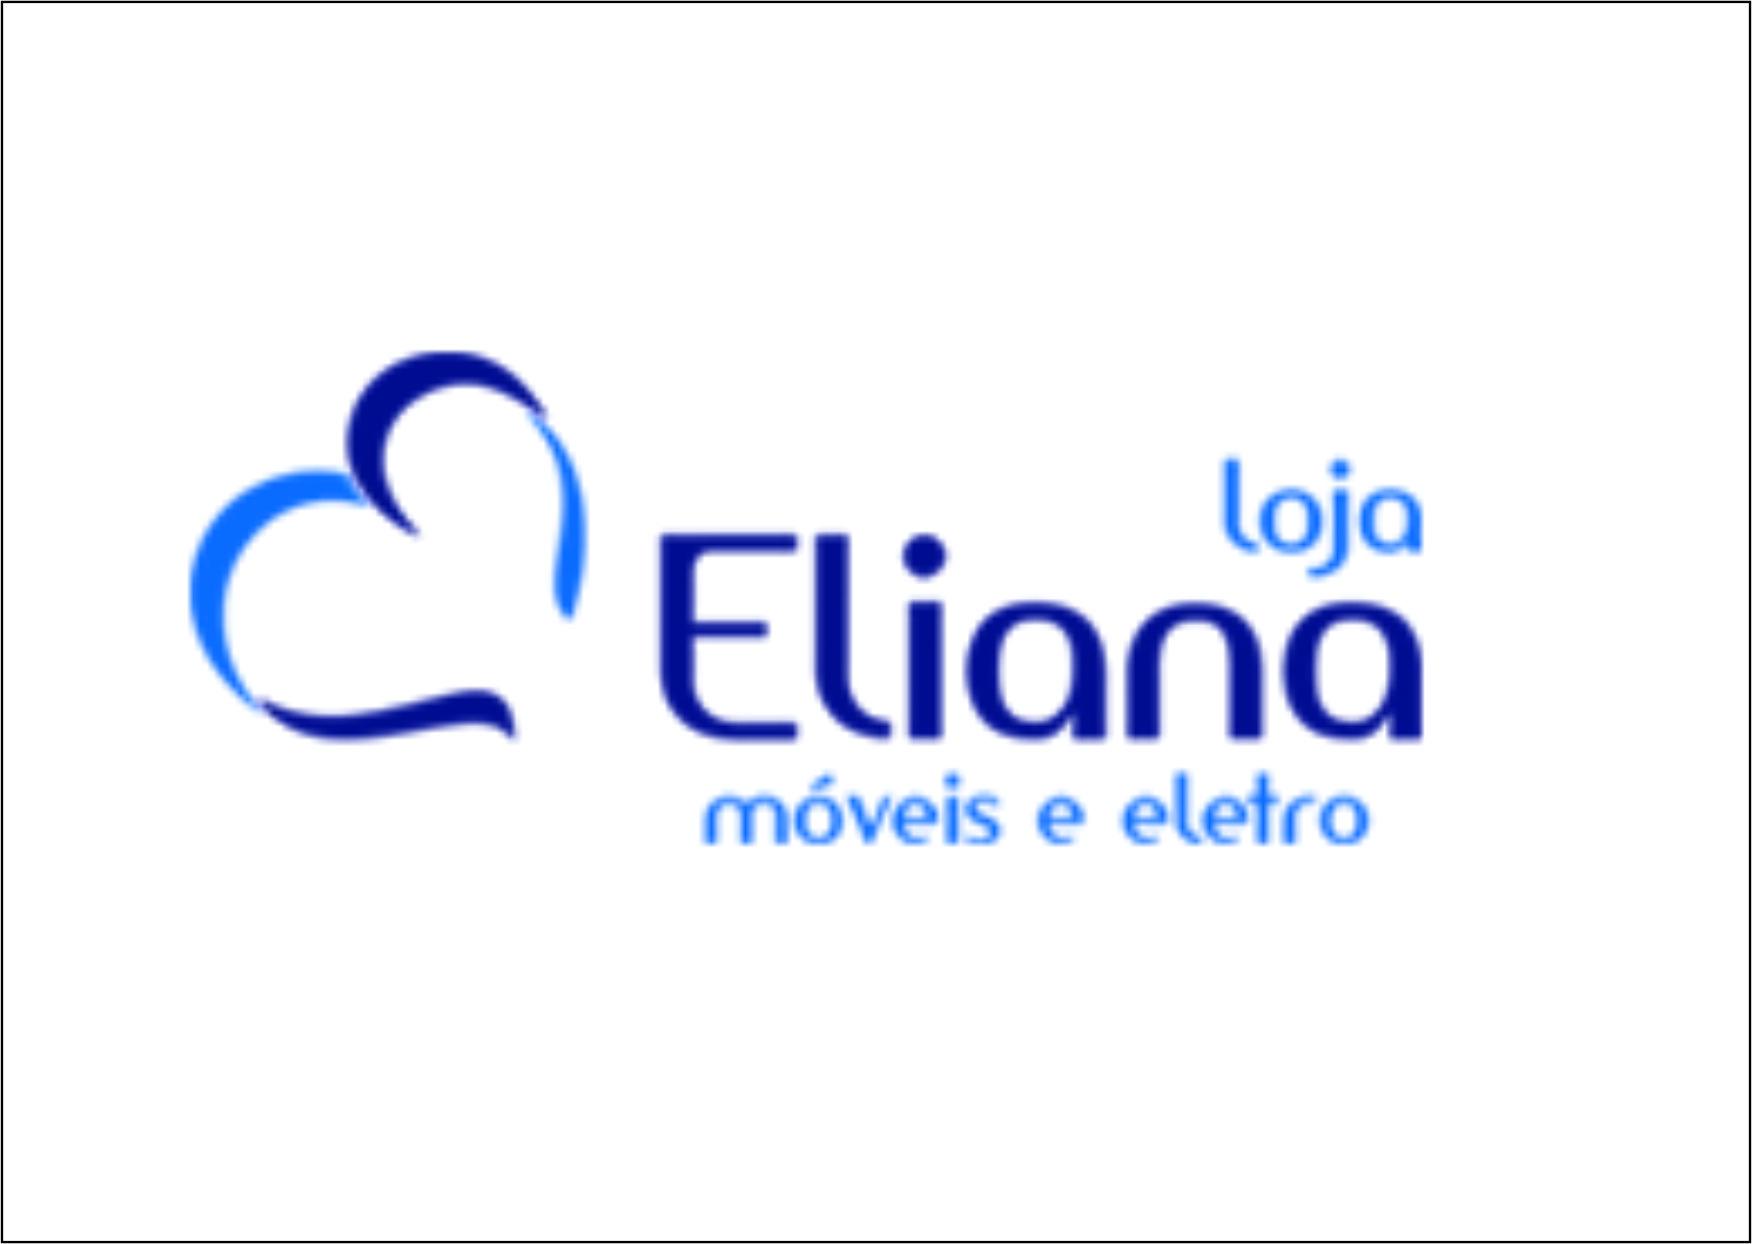 LOJA ELIANA